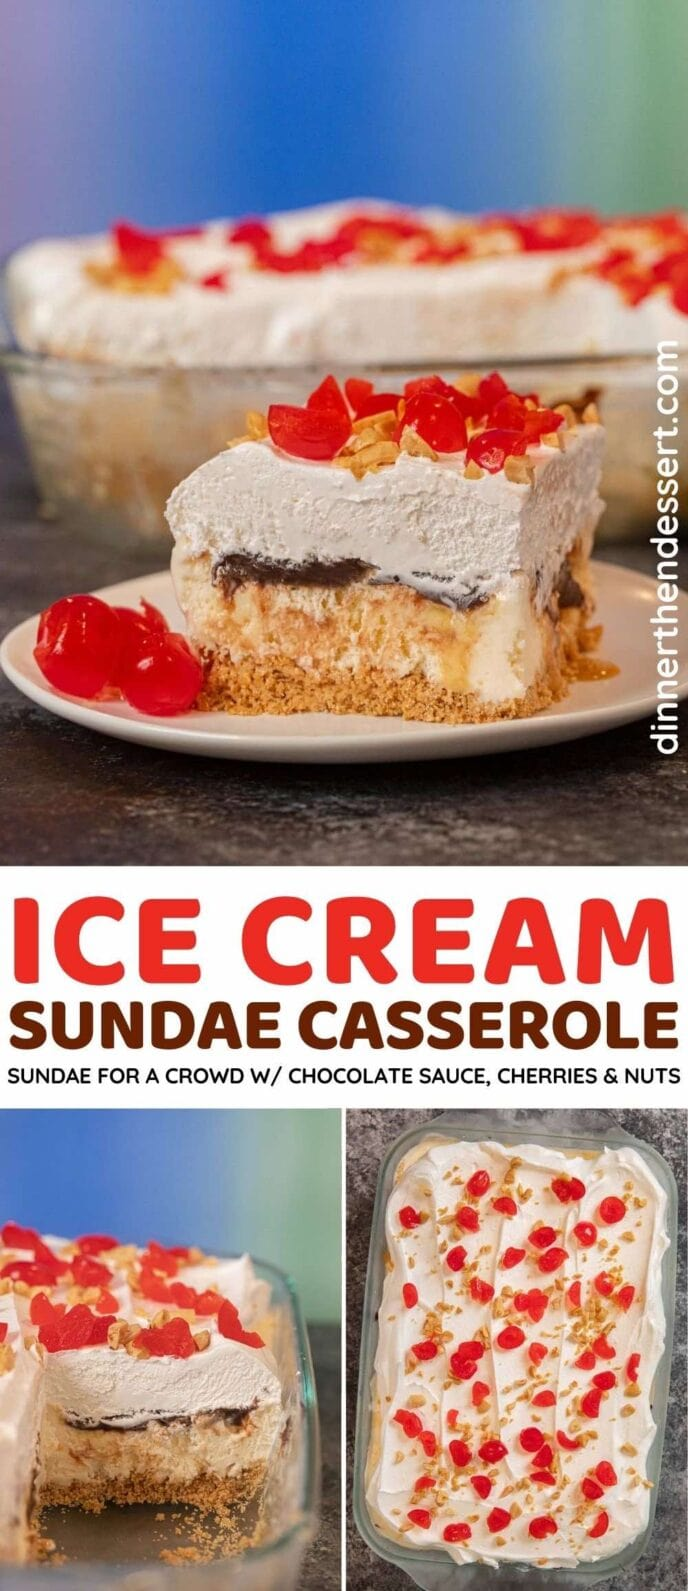 Ice Cream Sundae Casserole collage